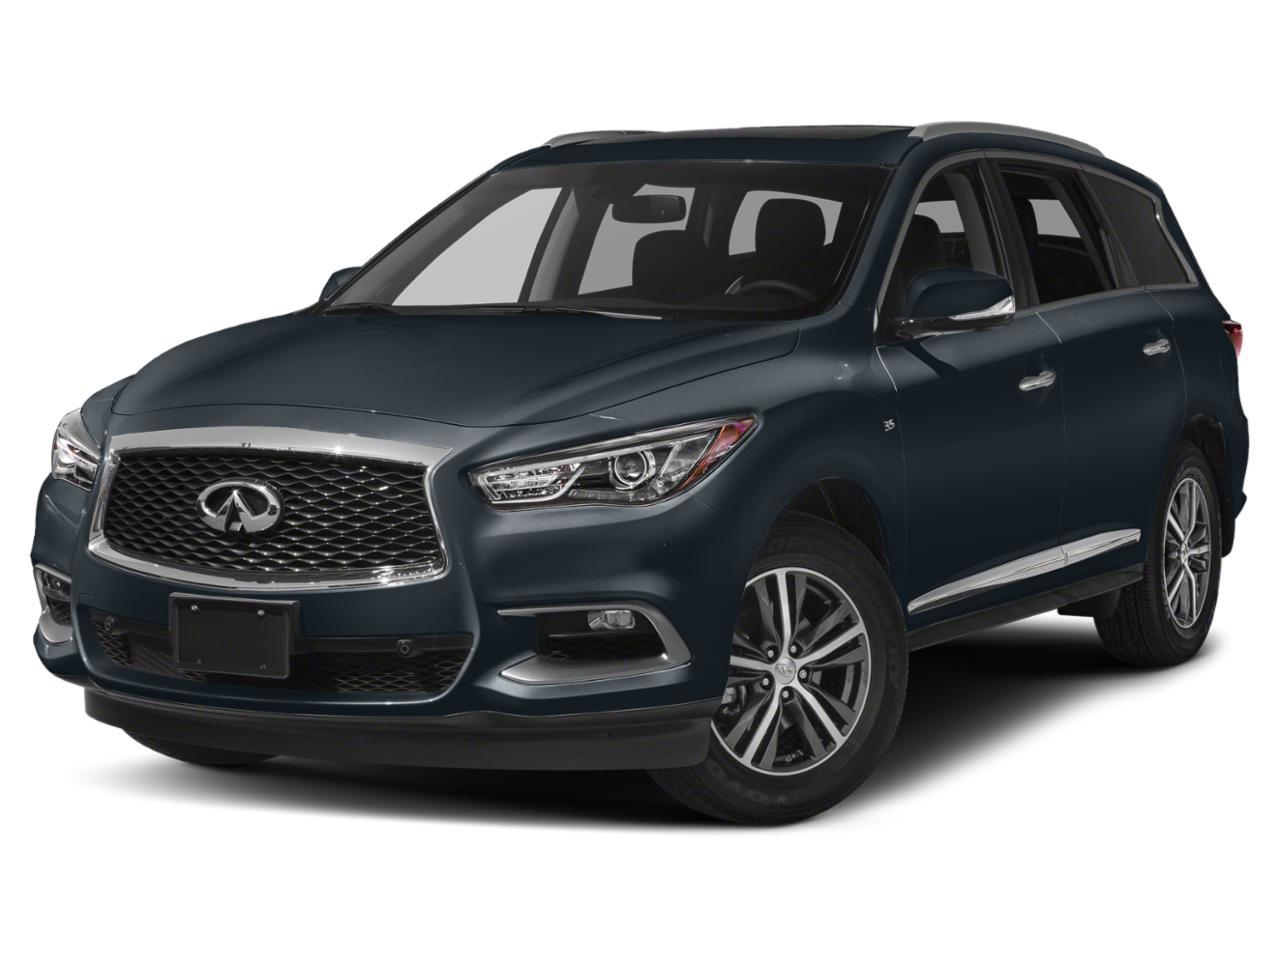 2018 INFINITI QX60 Vehicle Photo in San Antonio, TX 78230